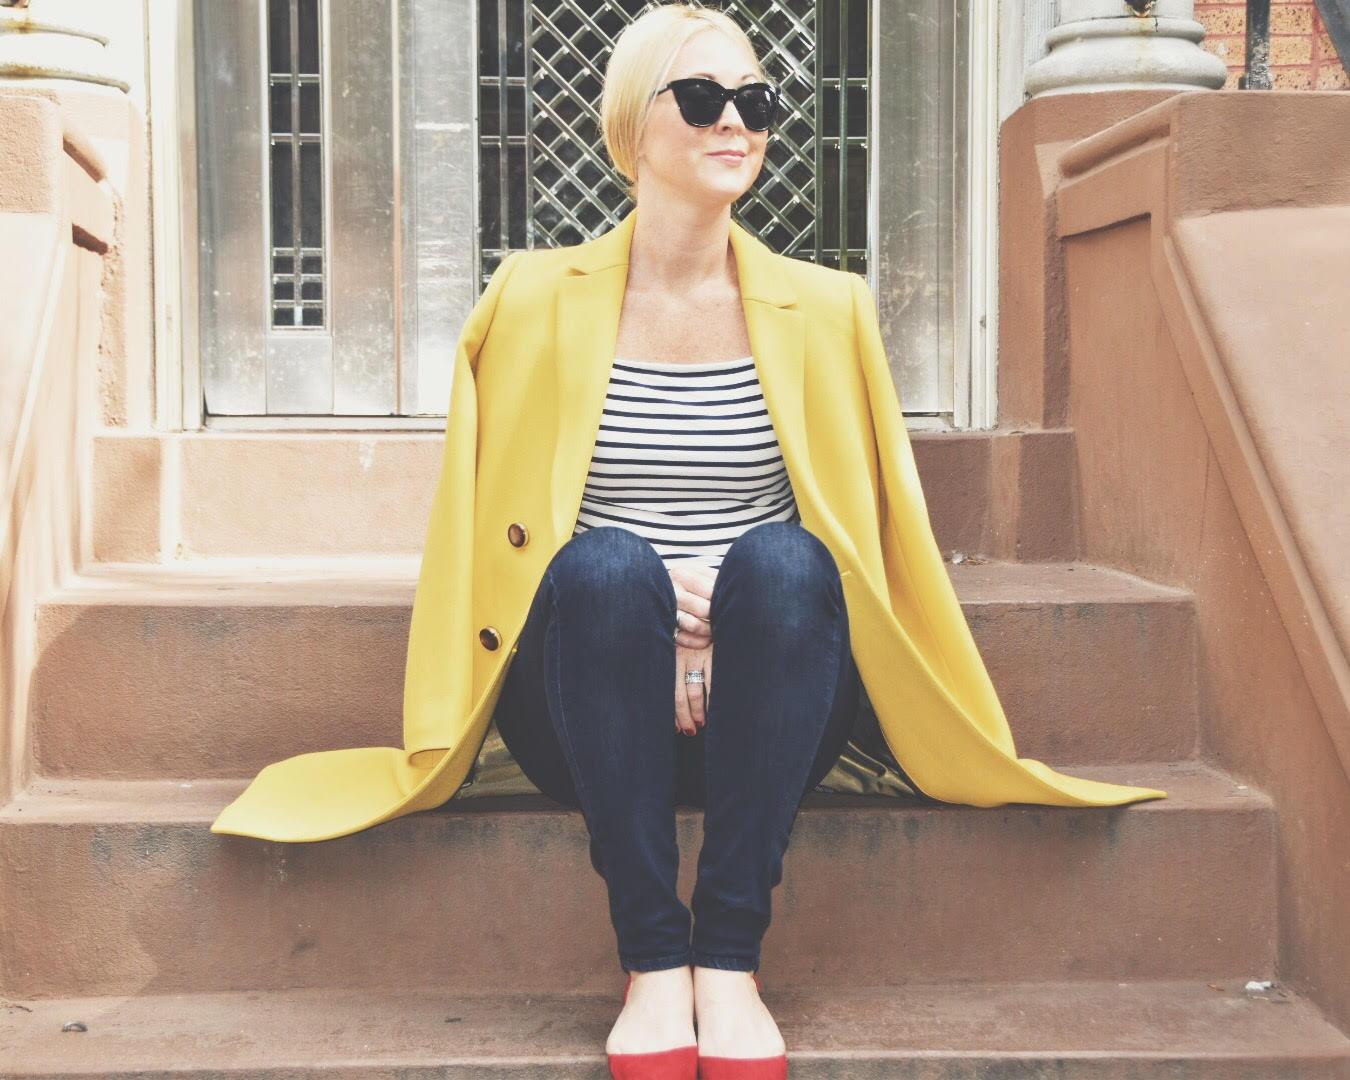 Chondra Sanchez in yellow Lafayette 148 coat on stoop